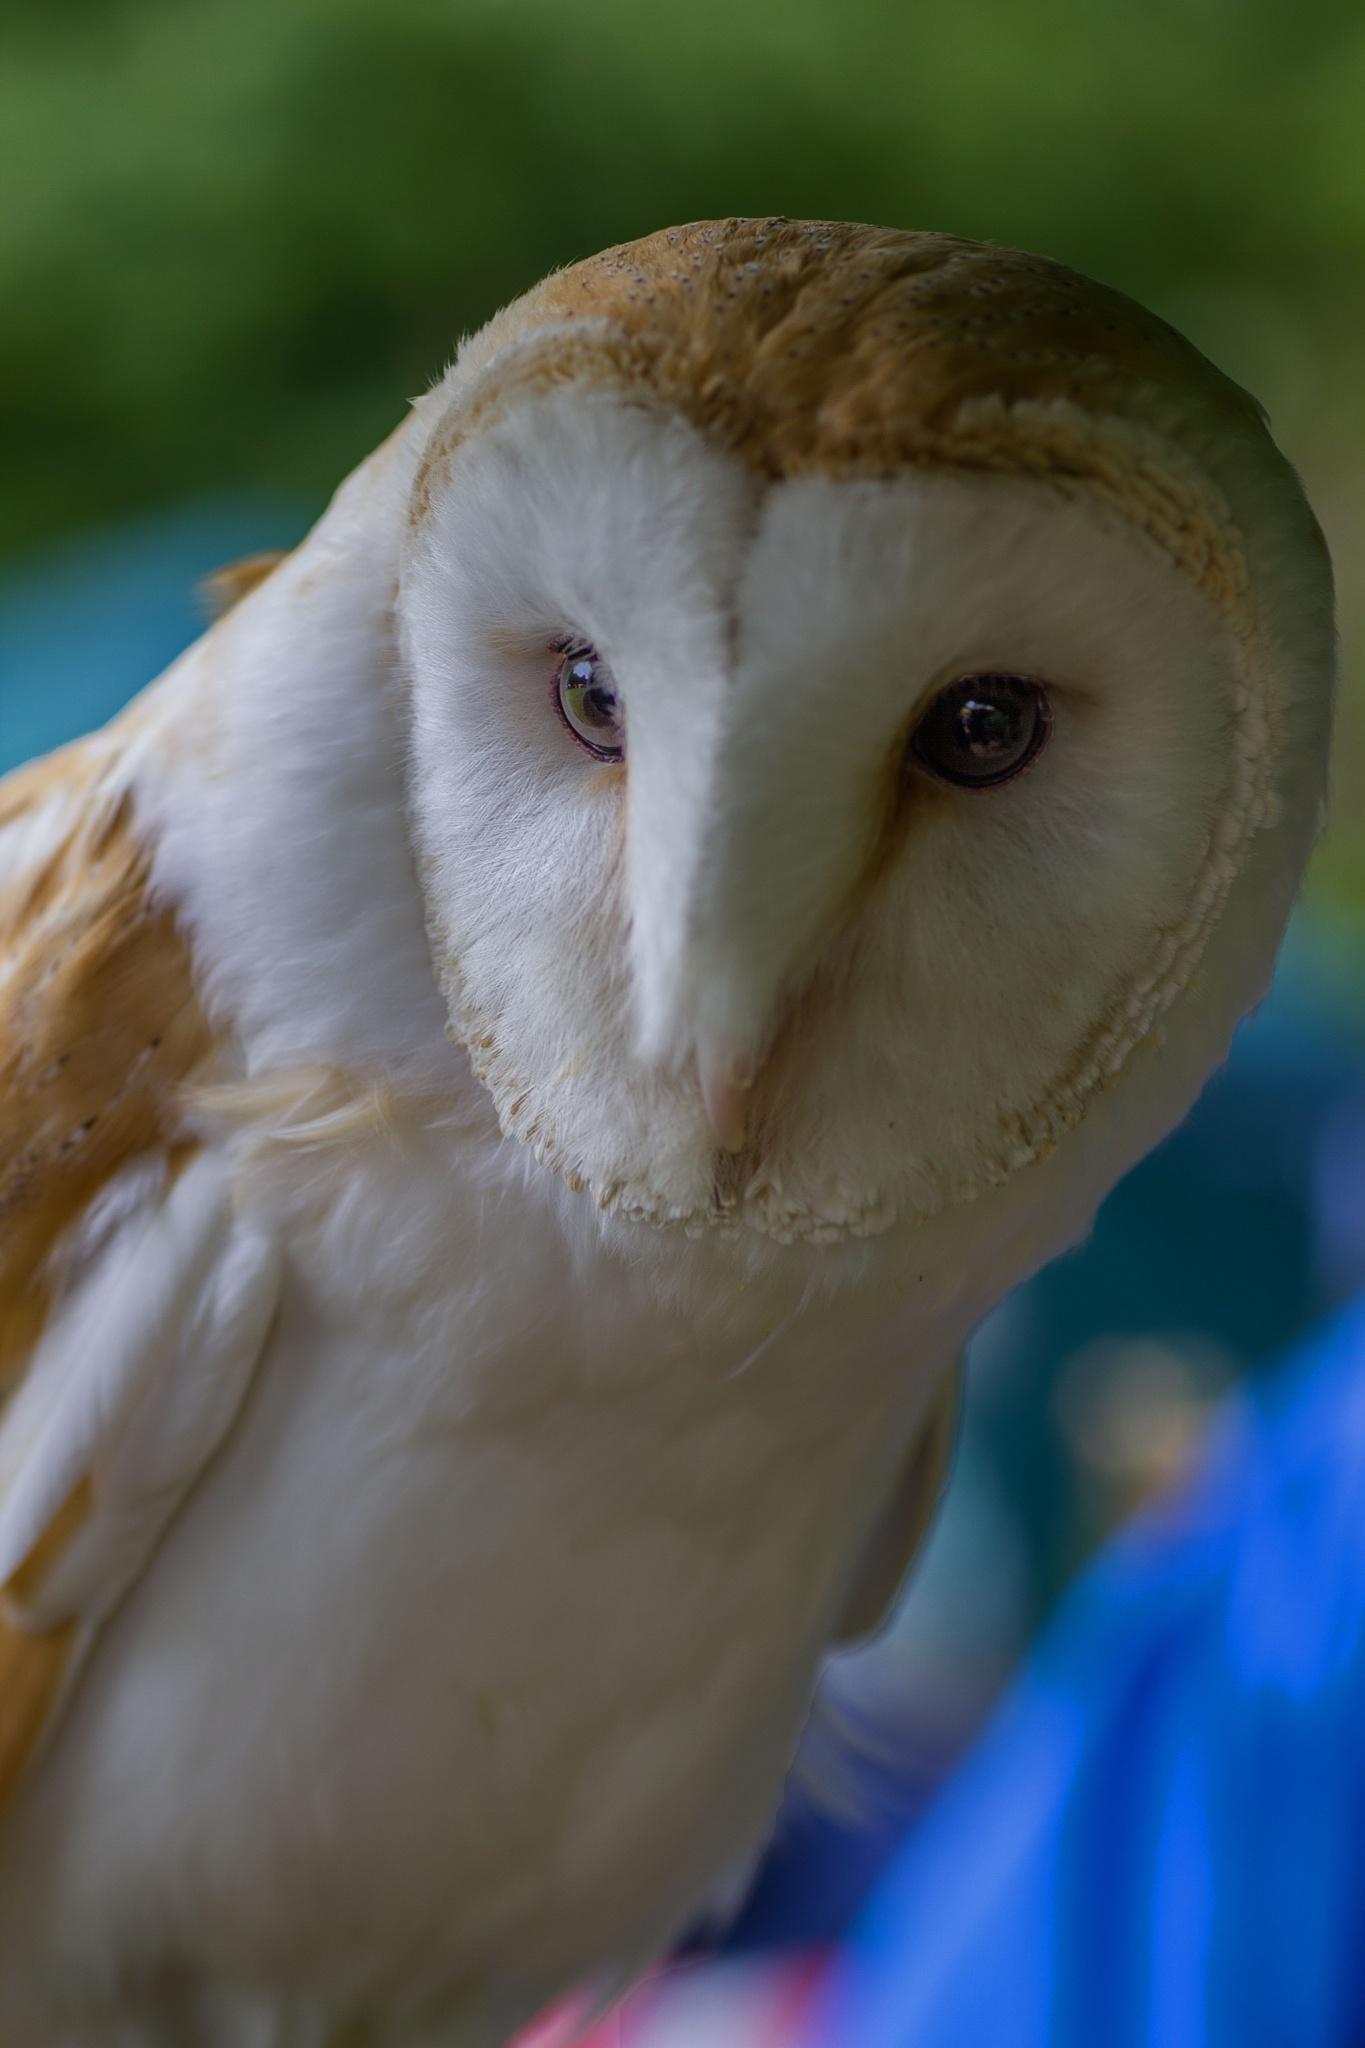 Little Owl by Sam Loughran